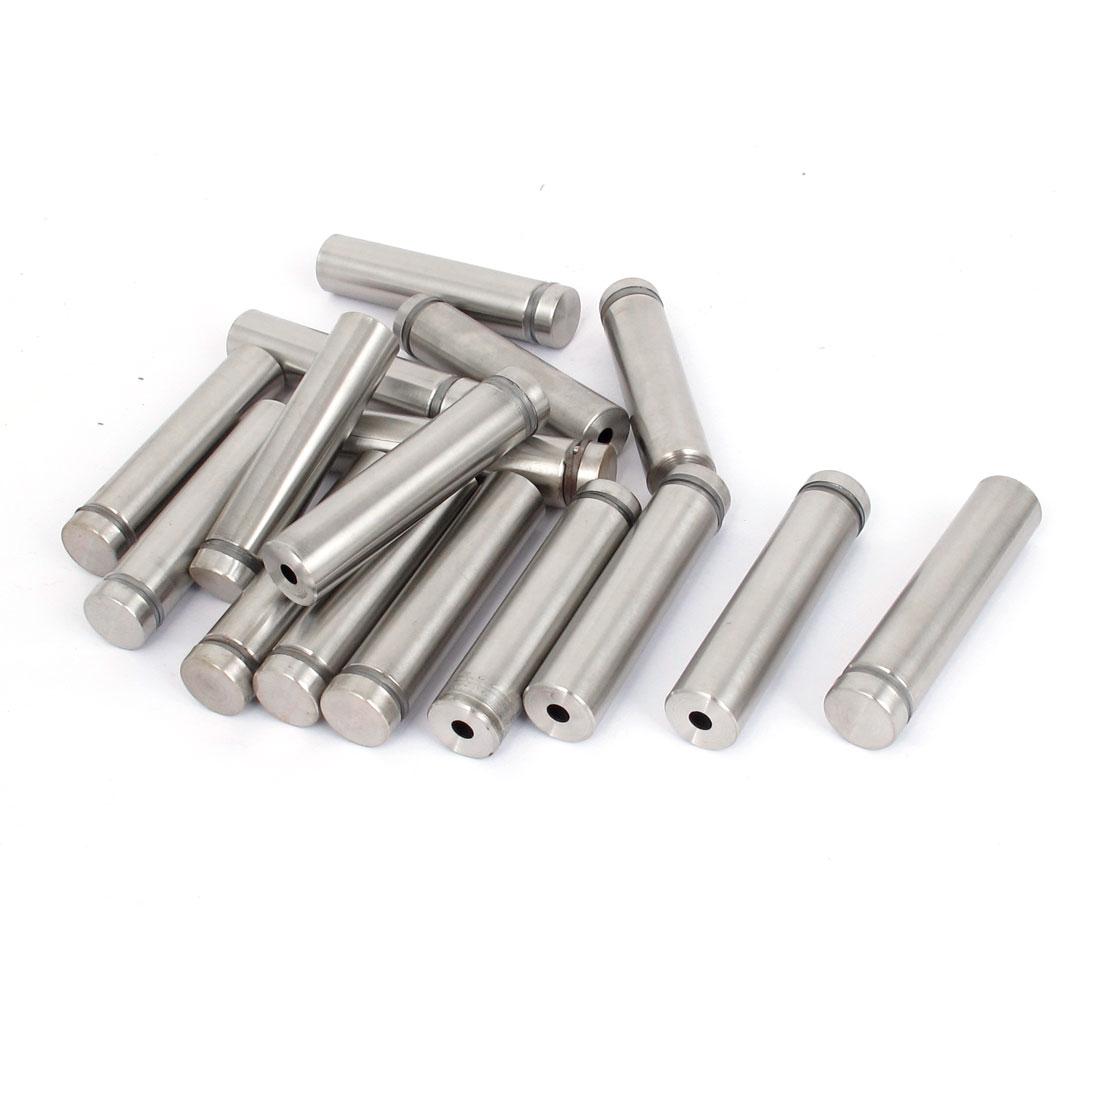 16mm x 70mm Stainless Steel Advertising Frameless Glass Standoff Pins 16pcs